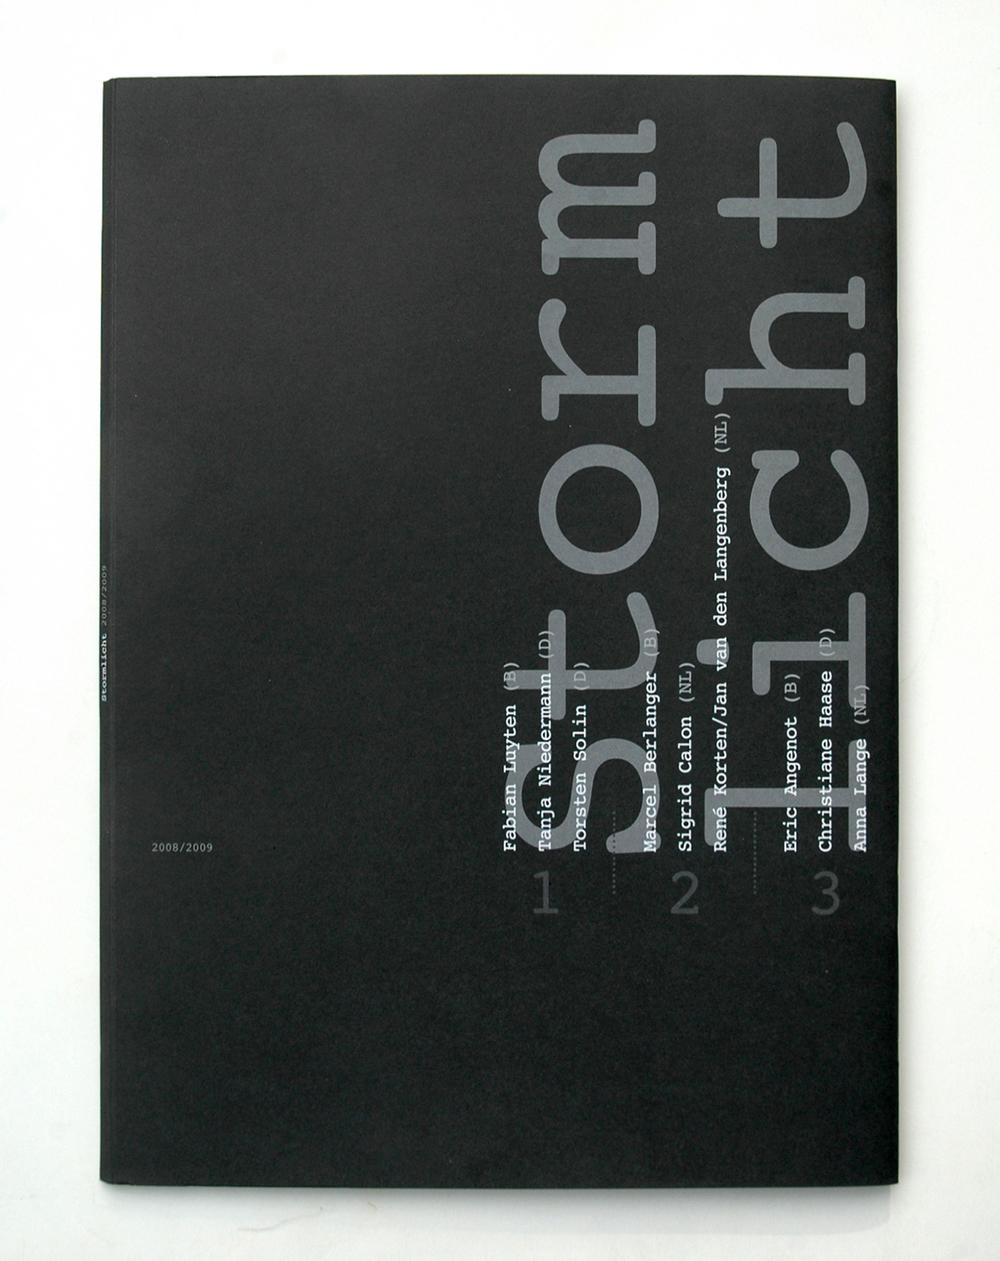 2009 Stormlicht Cover SQ.jpg